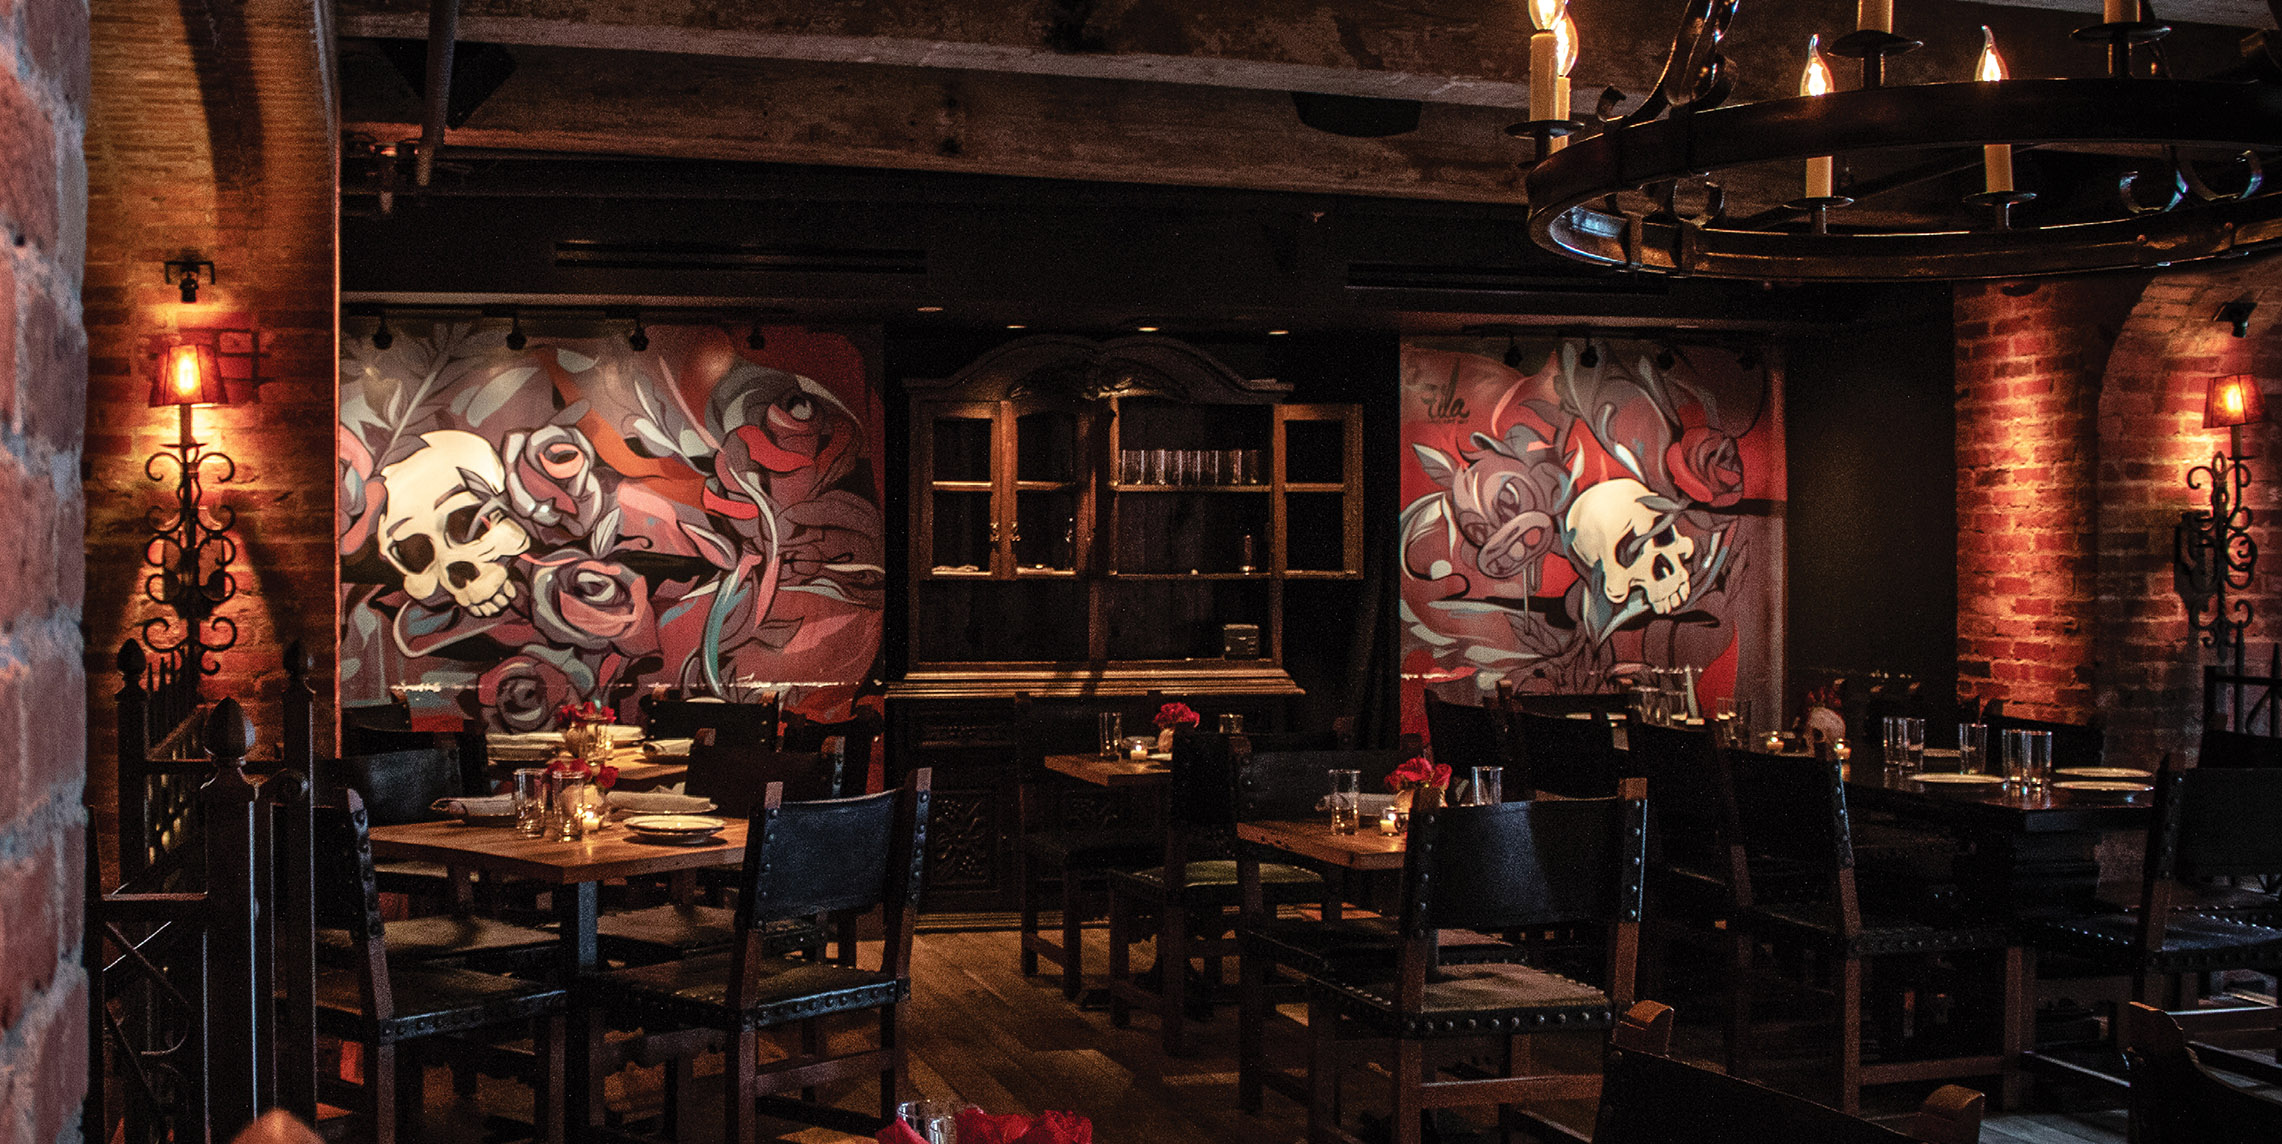 Lolita Mexican Restaurant Branding mural design